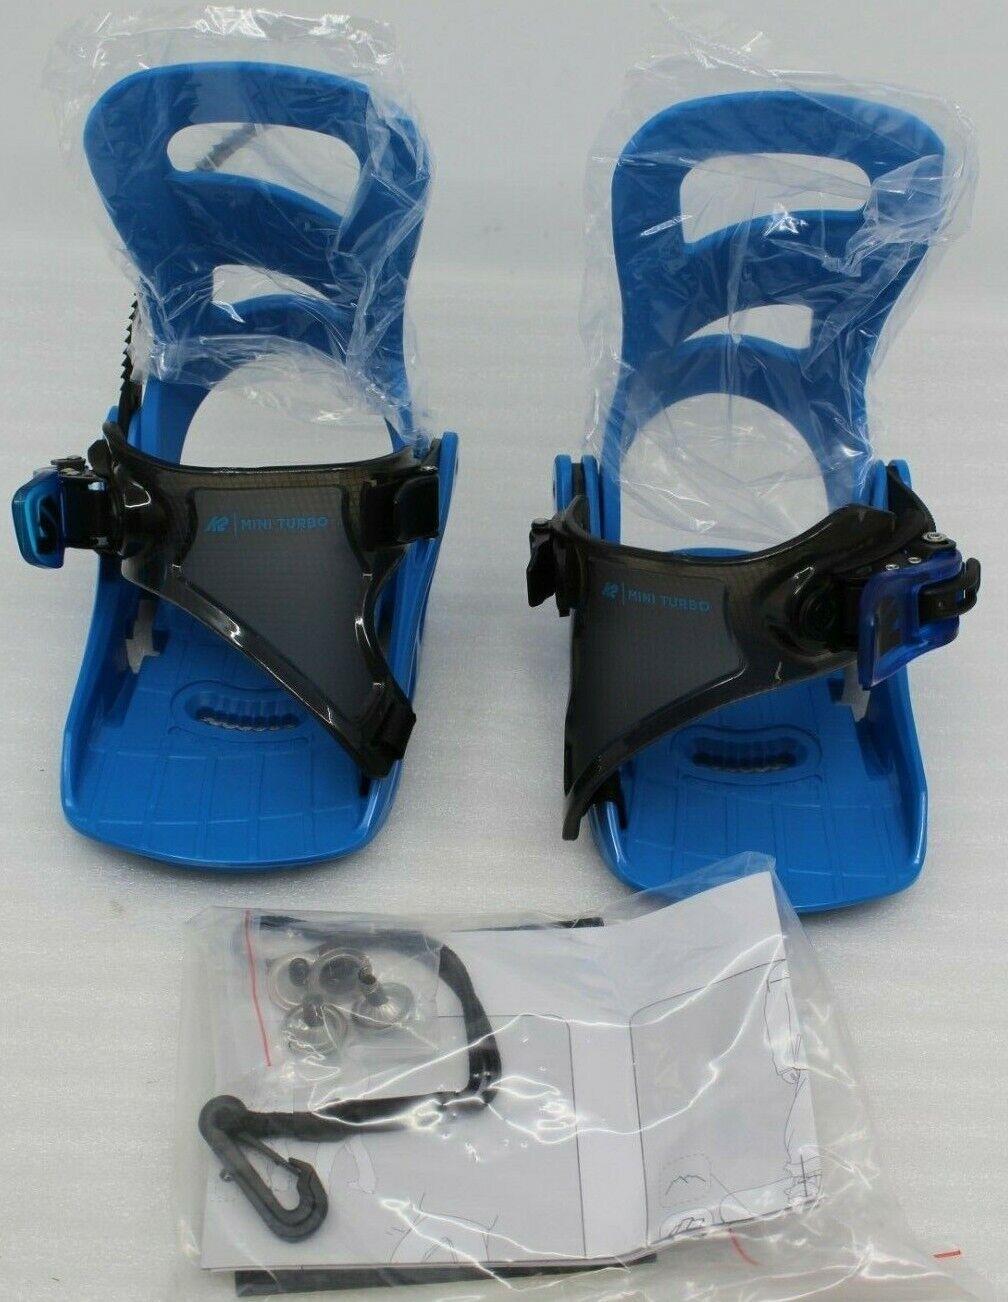 K2 Snowboardbindung Mini Turbo bluee Gr. XS 29-33,5 blue für Kinder Bindung NEU